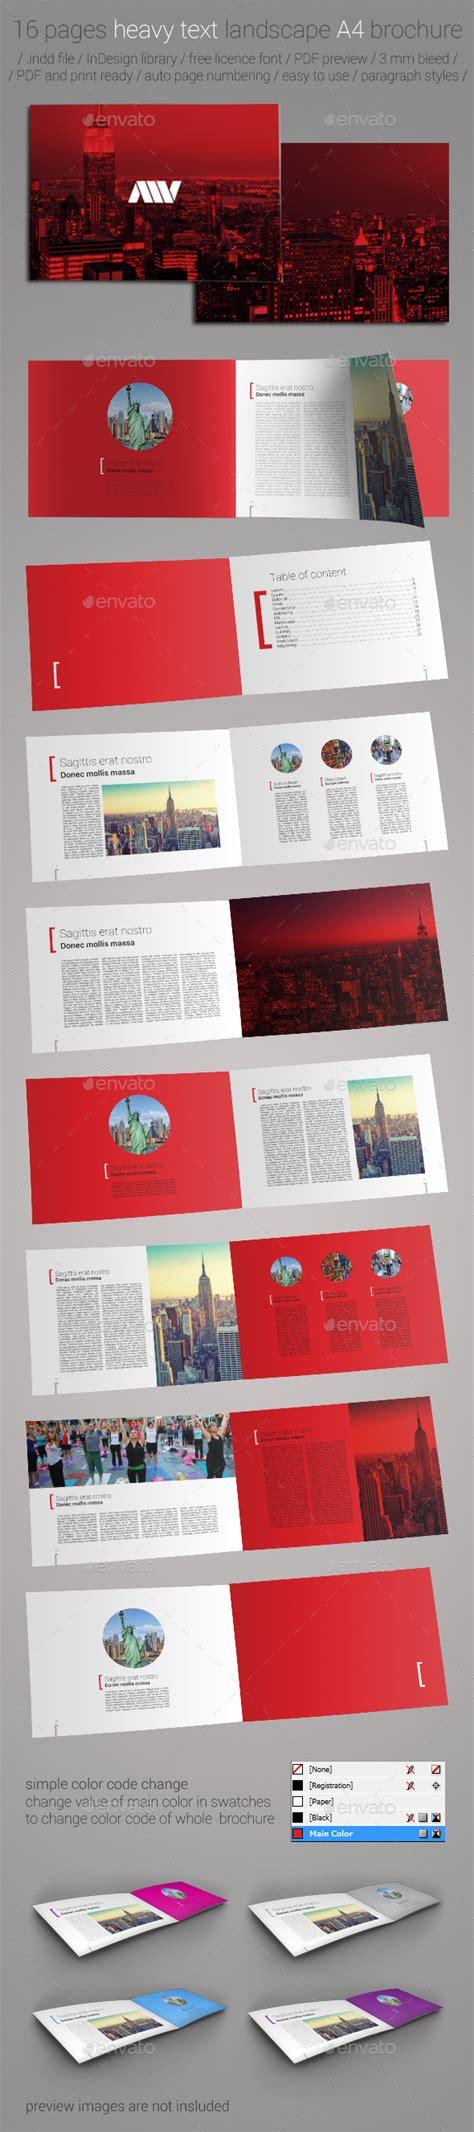 16 Pages A4 Landscape Brochure Template By Miljan Vulovic Graphicriver Pages Brochure Template